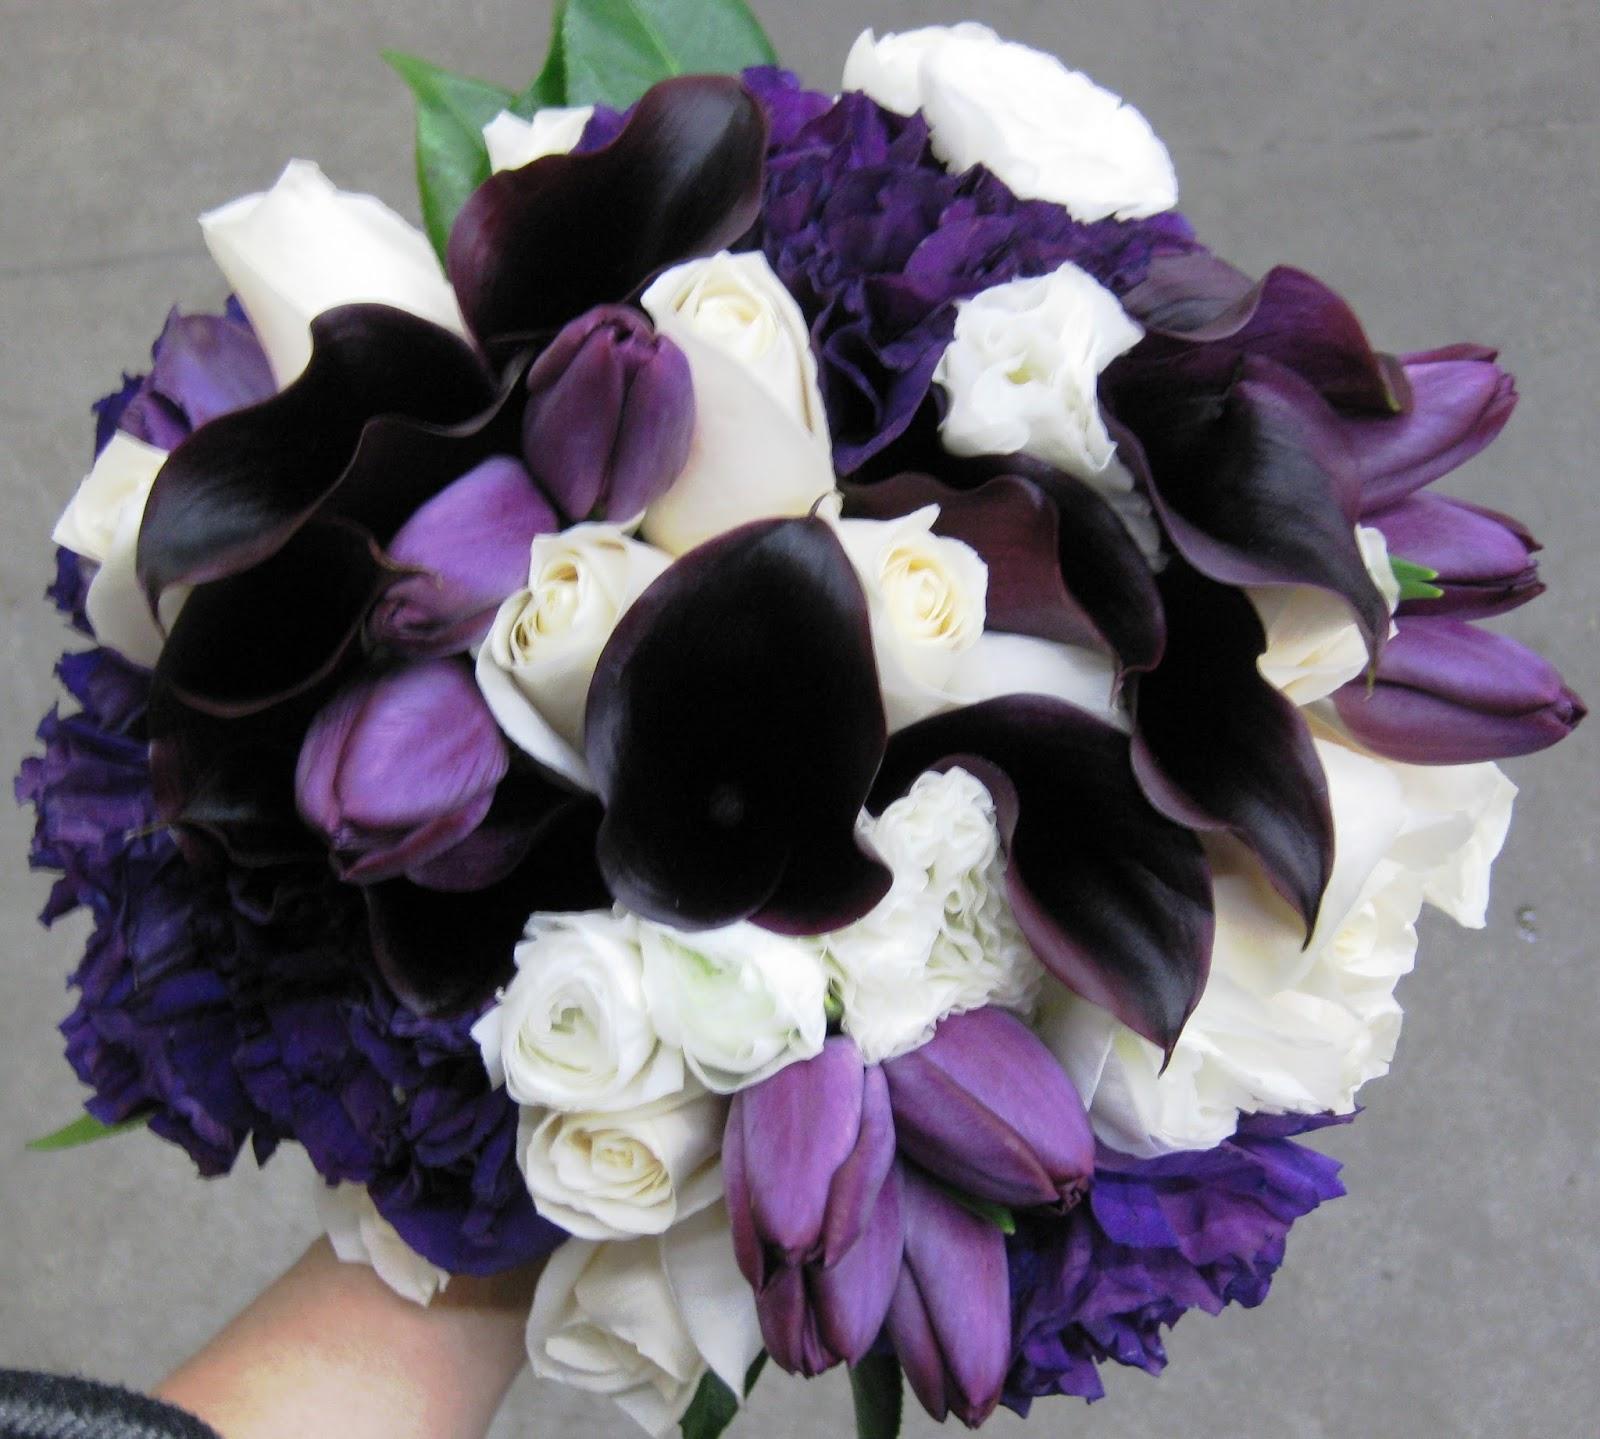 Sonal j shah event consultants llc purple bridesmaid bouquets